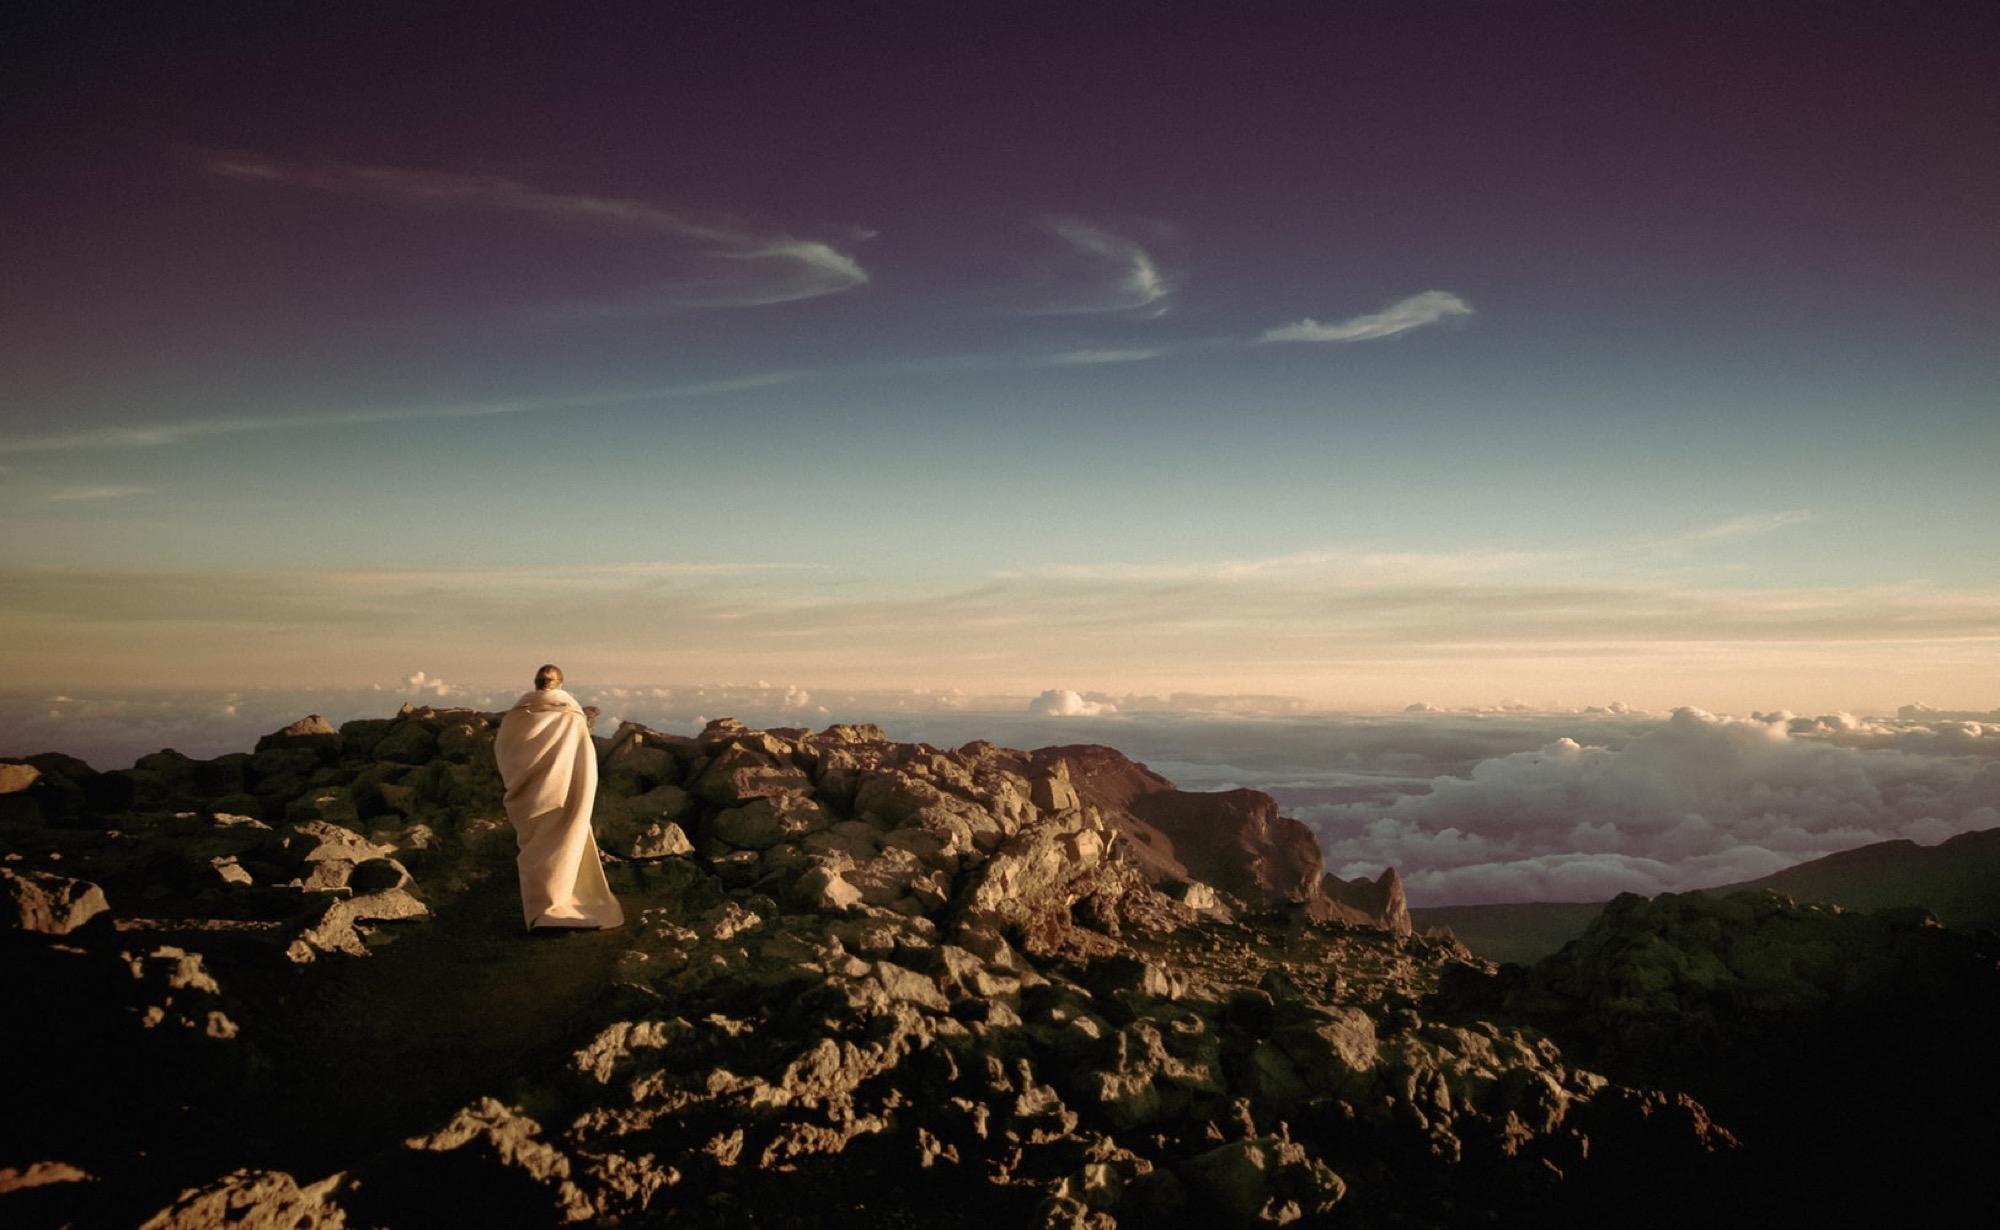 Epileptics with Mystical Experiences